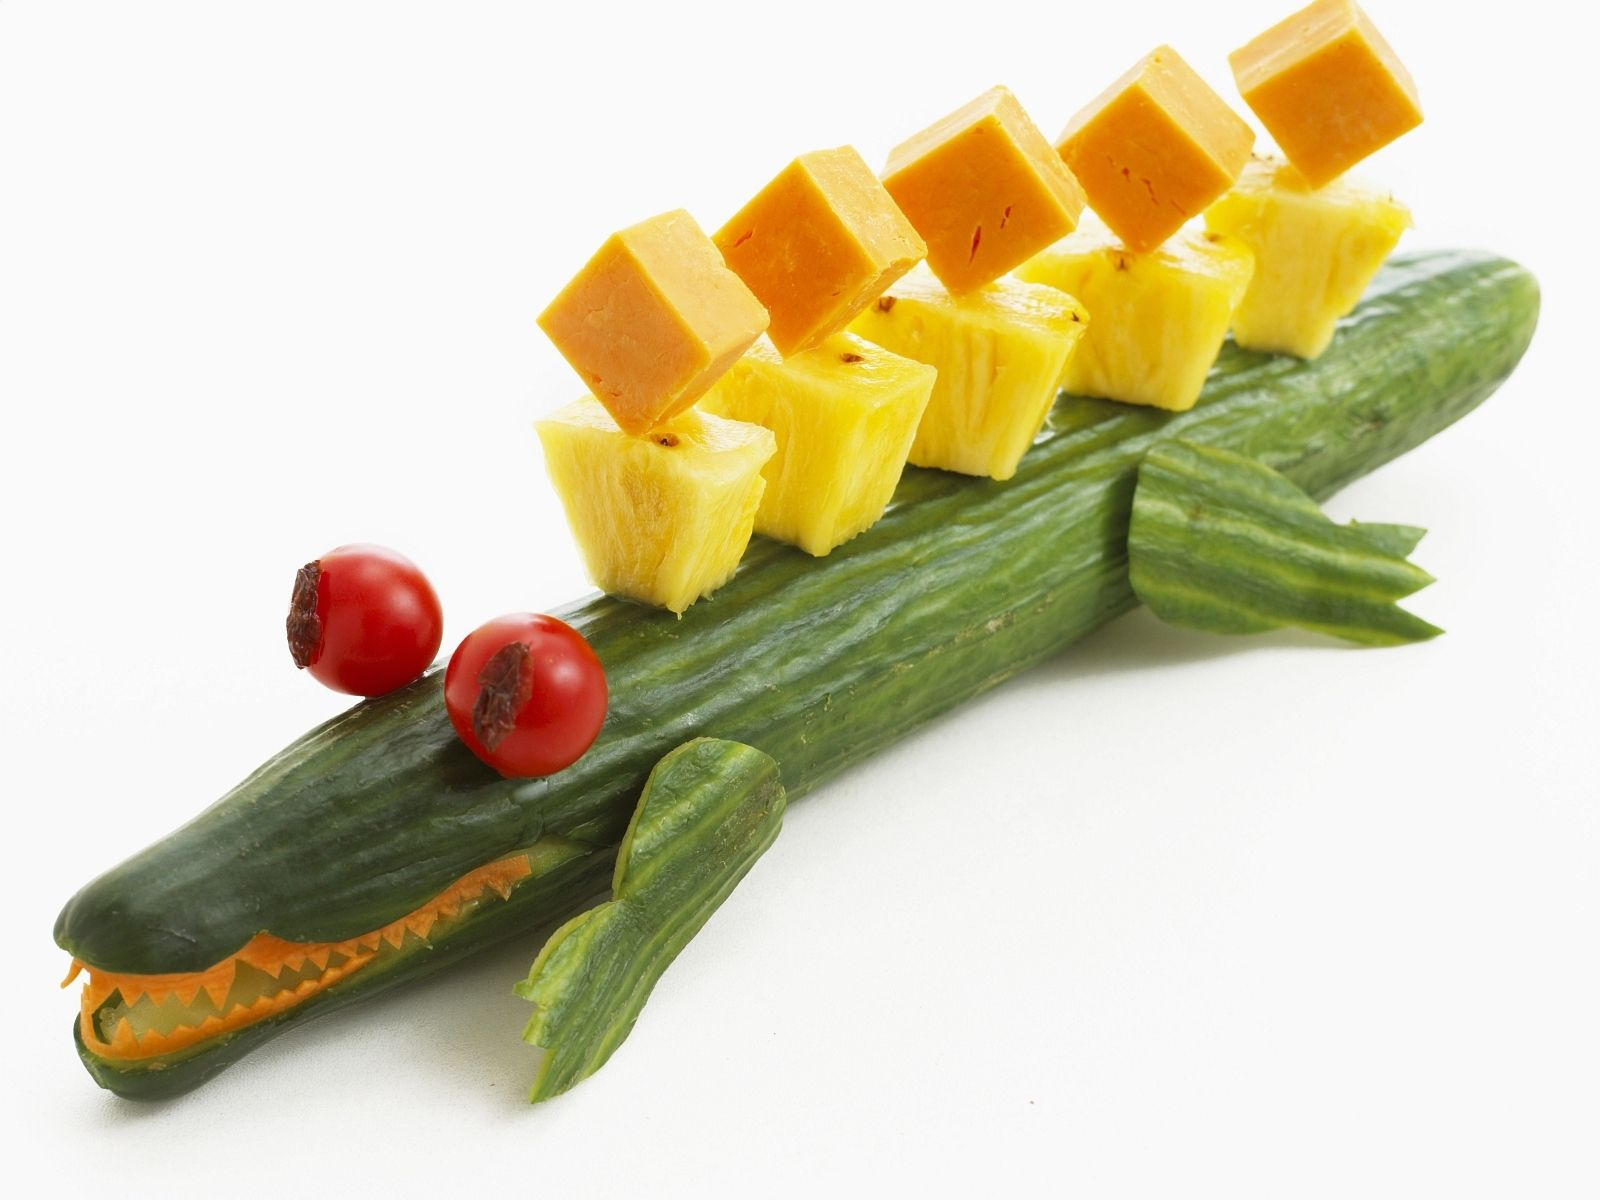 salatgurke mit ananas und k sew rfeln rezept kindergeburtstag pinterest salat. Black Bedroom Furniture Sets. Home Design Ideas